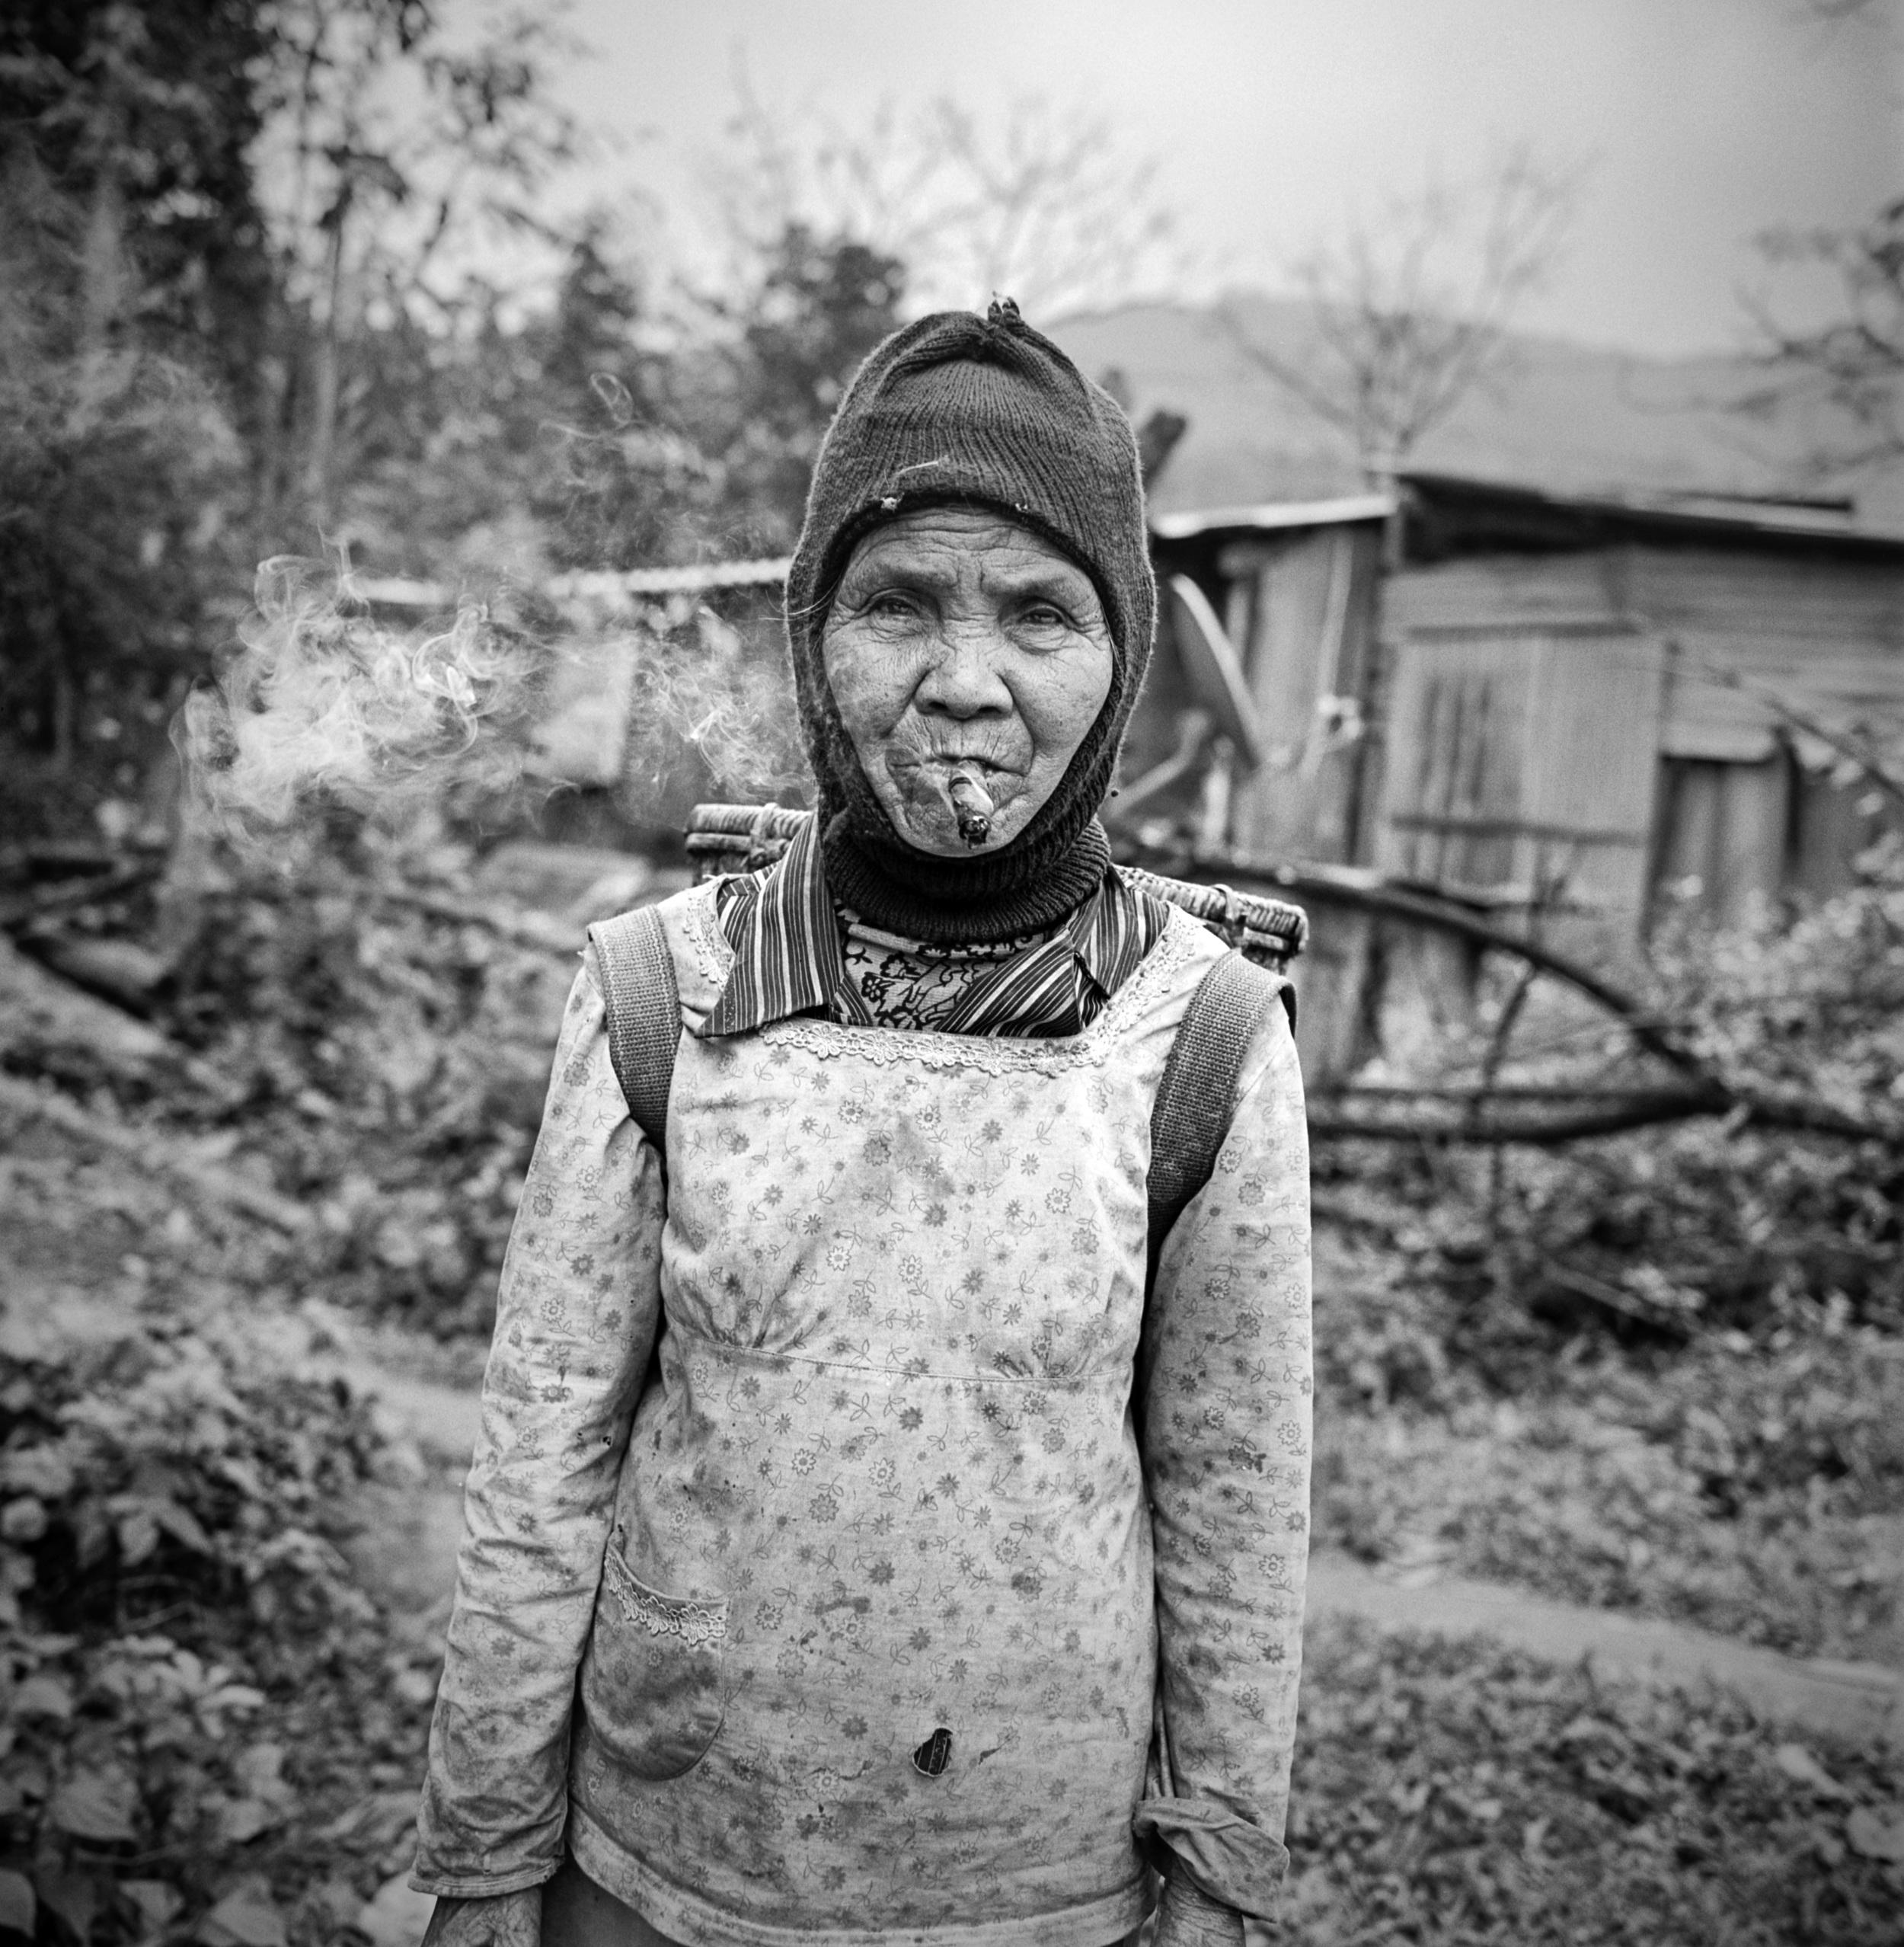 Woman on the trail Ho Chi Minh Trail, Vietnam, 2015